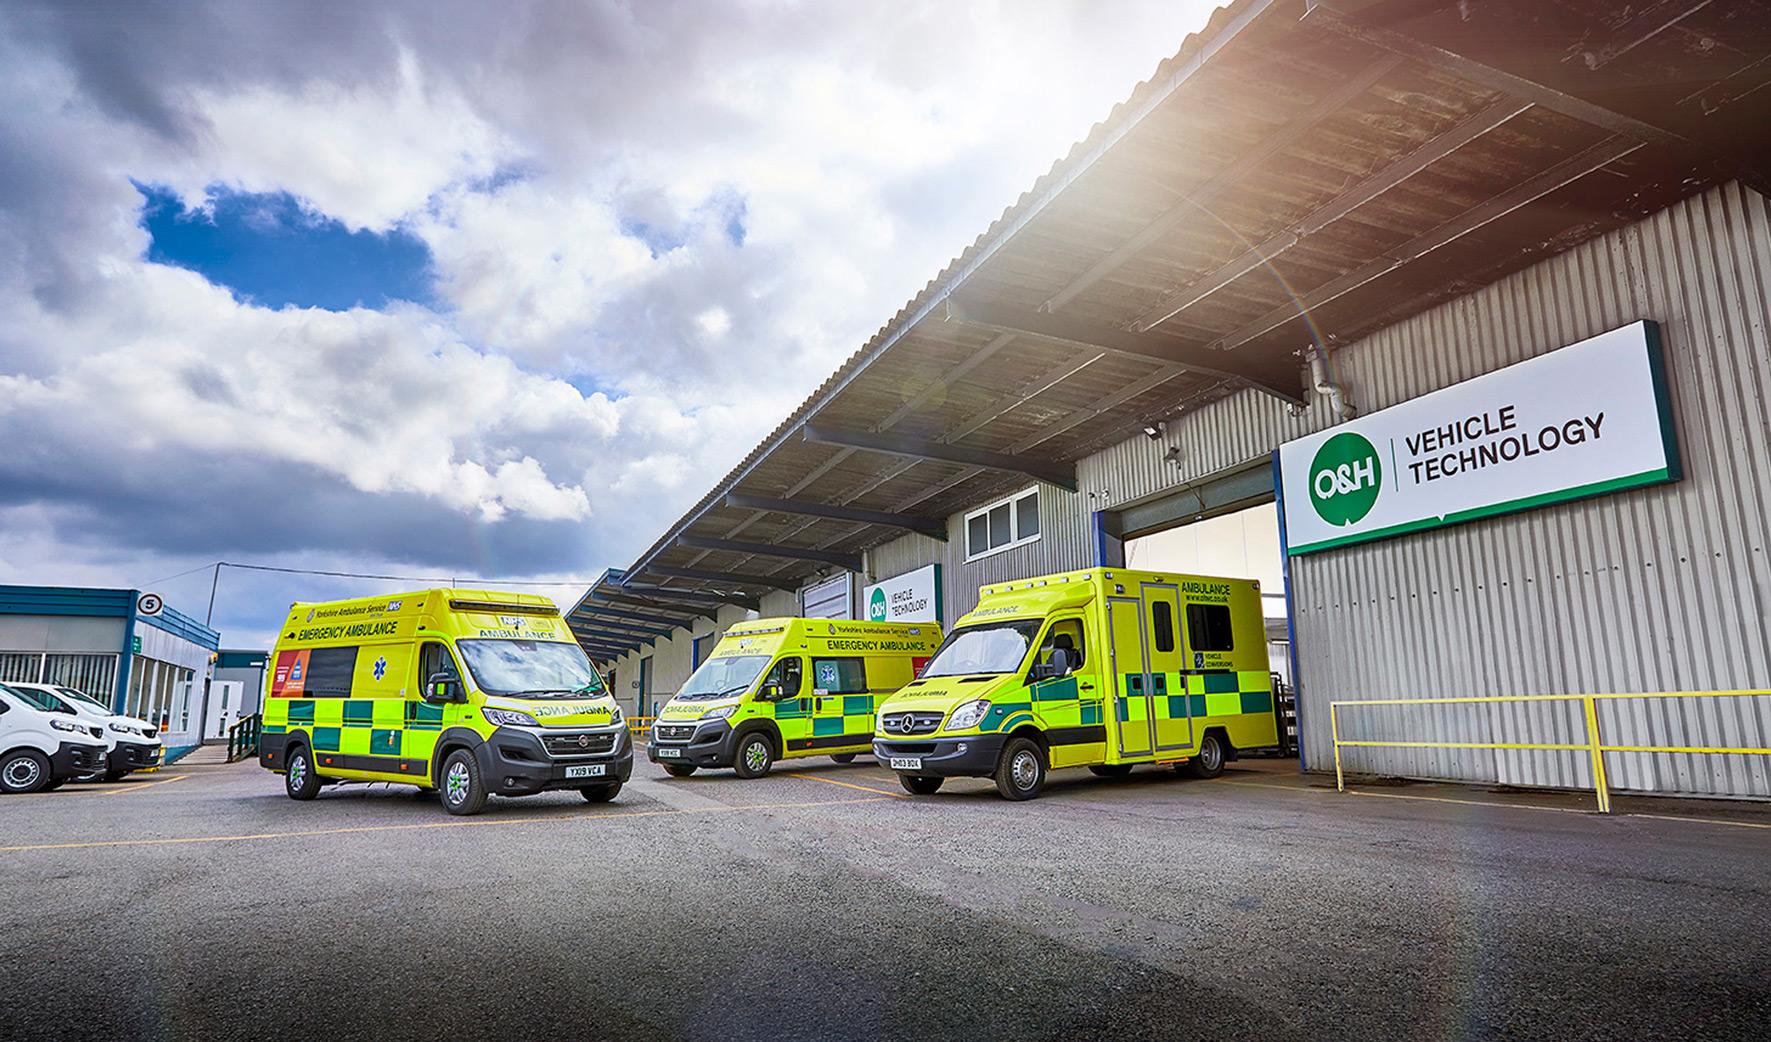 O&H Vehicle Technology Branding